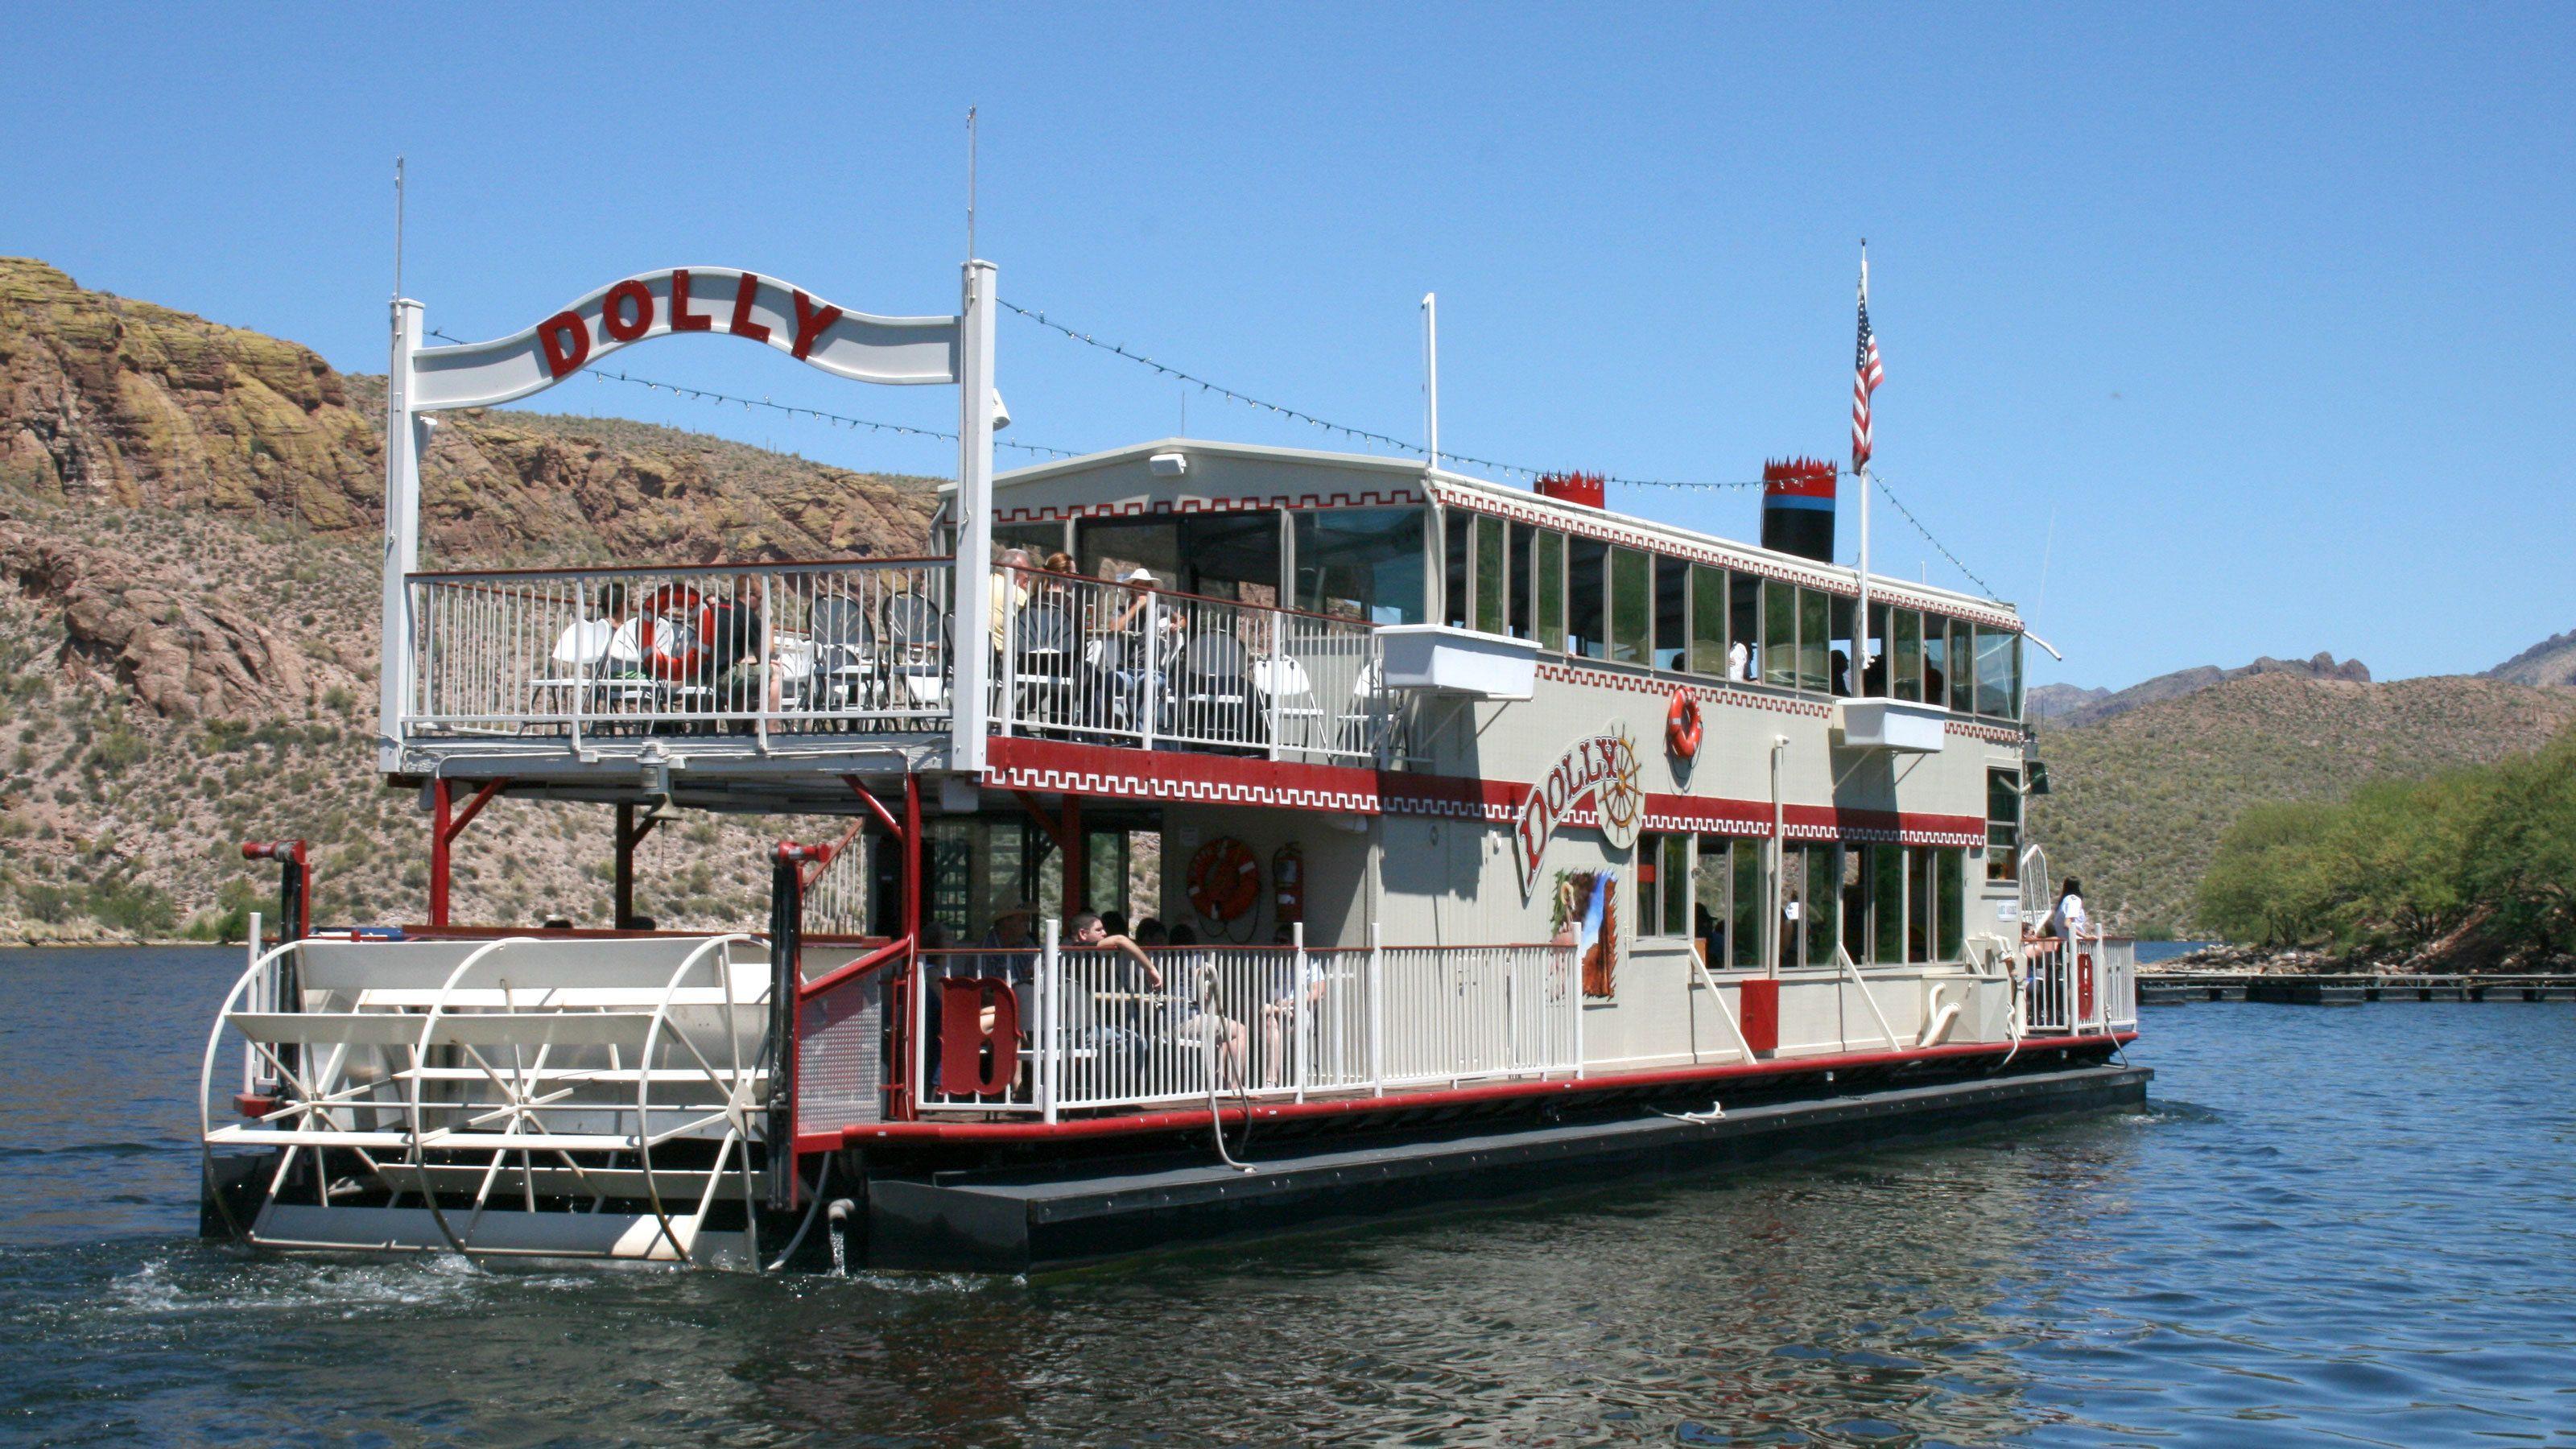 Steamboat on Canyon Lake in Arizona